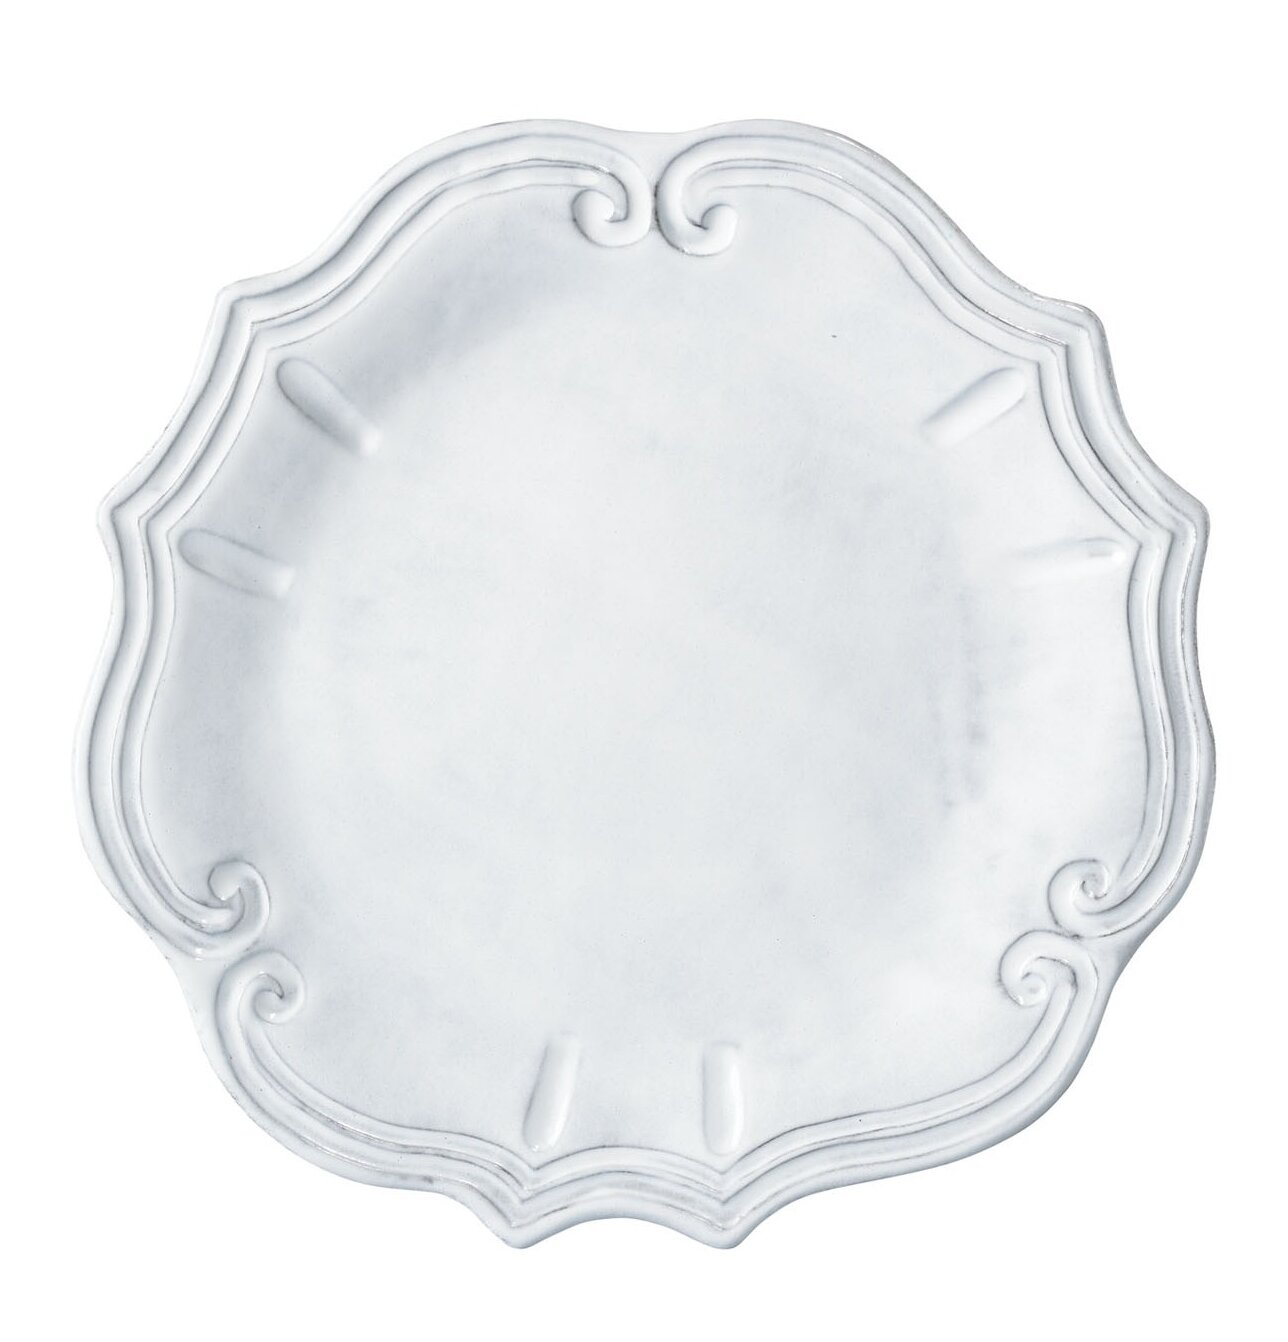 Vietri Incanto 12 Dinner Plate Perigold